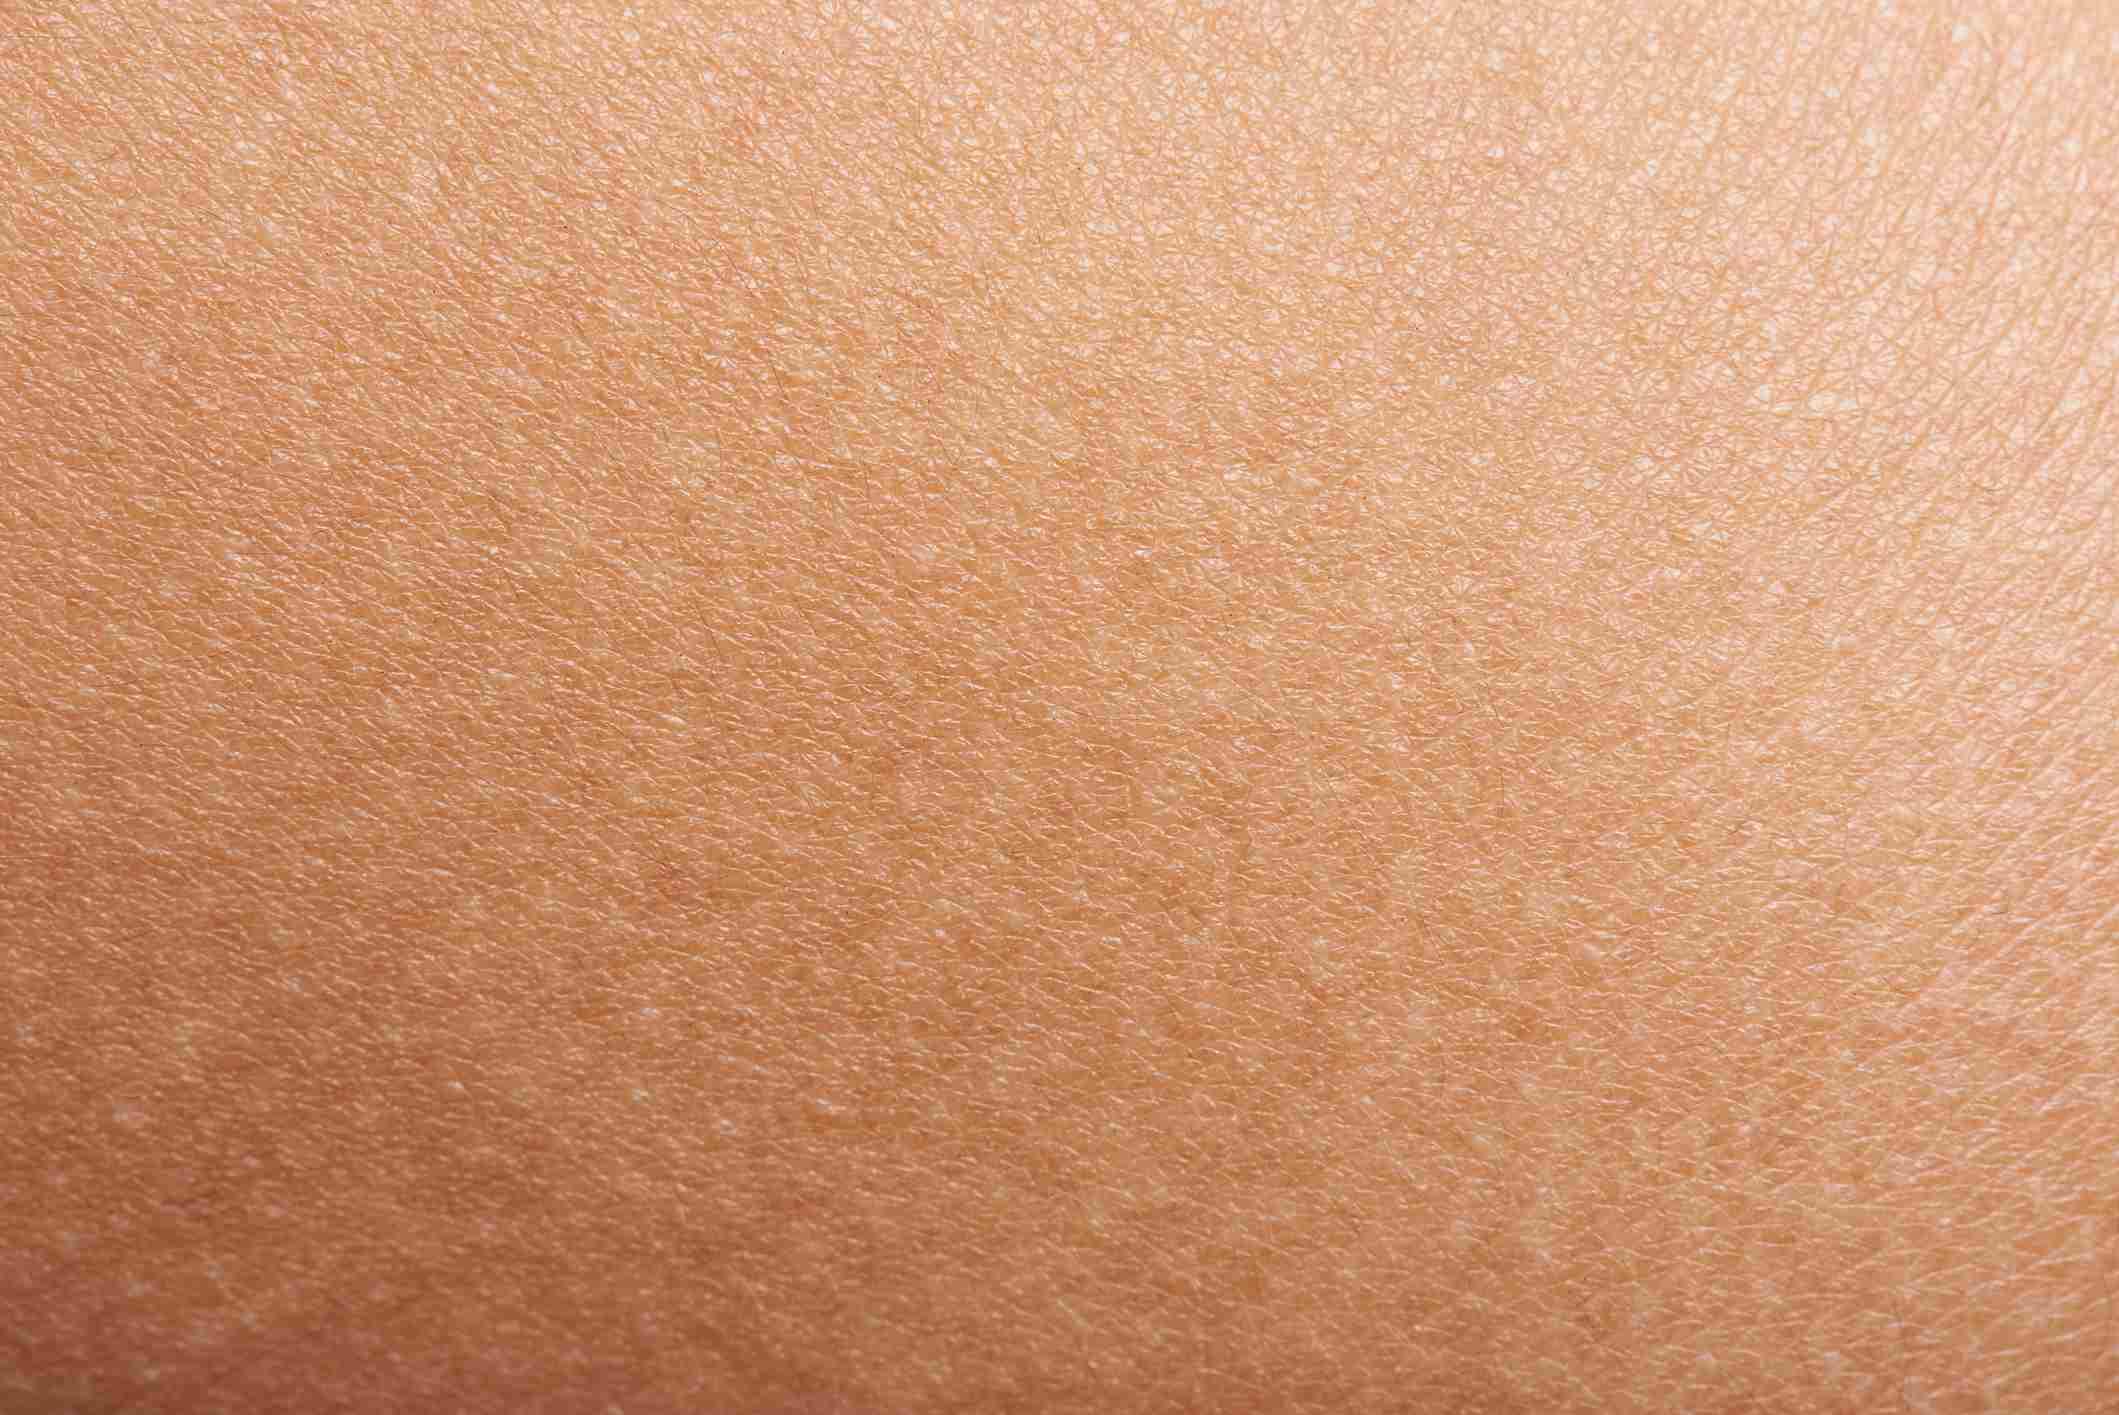 White Spots on Skin: Idiopathic Guttate Hypomelanosis